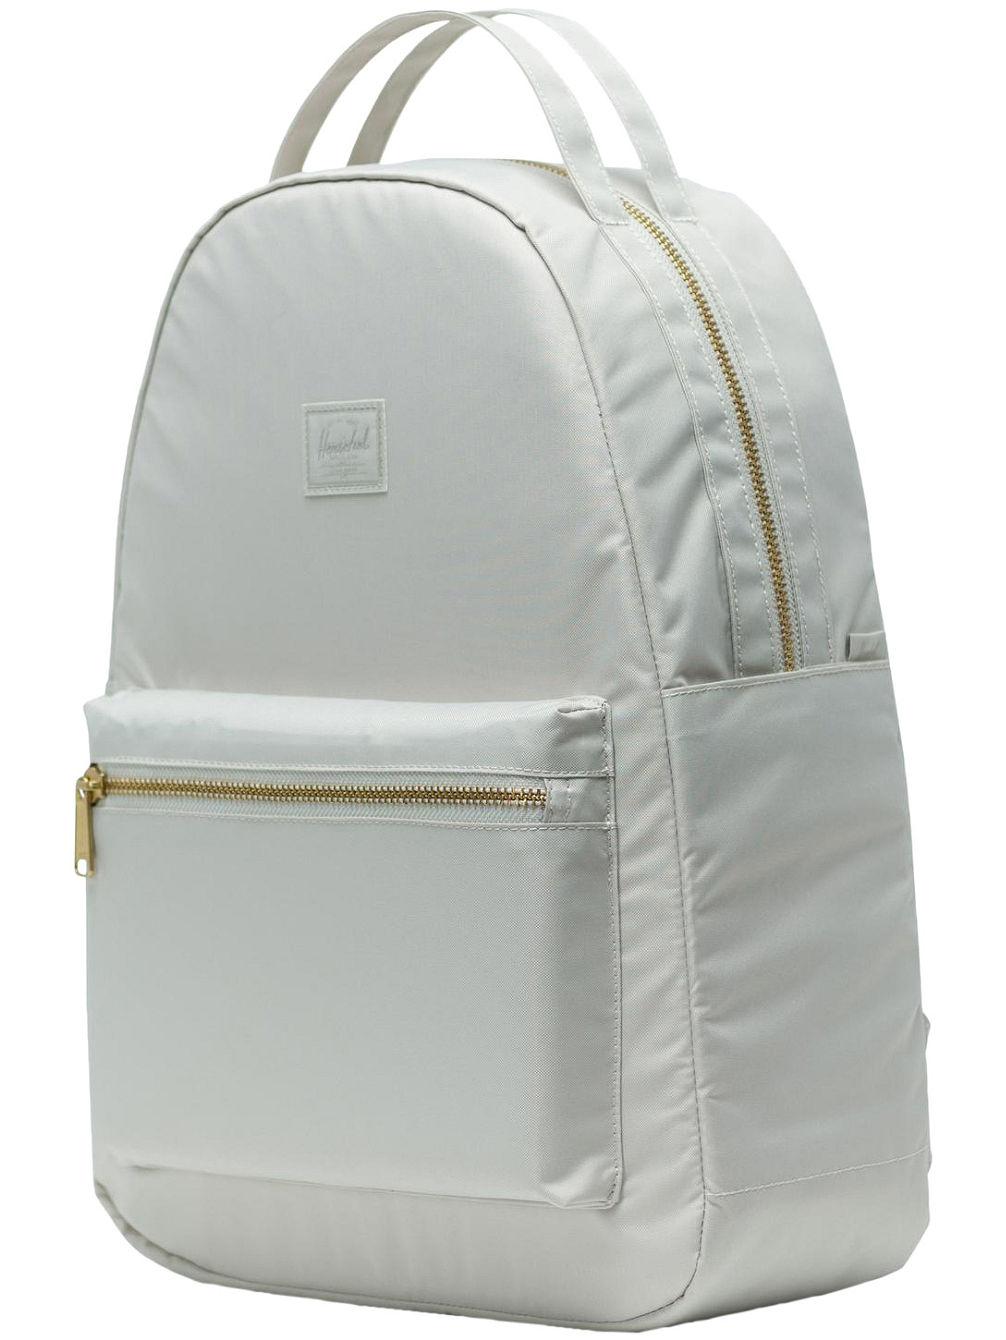 1aaa24684ab Buy Herschel Nova Mid-Volume Light Backpack online at Blue Tomato